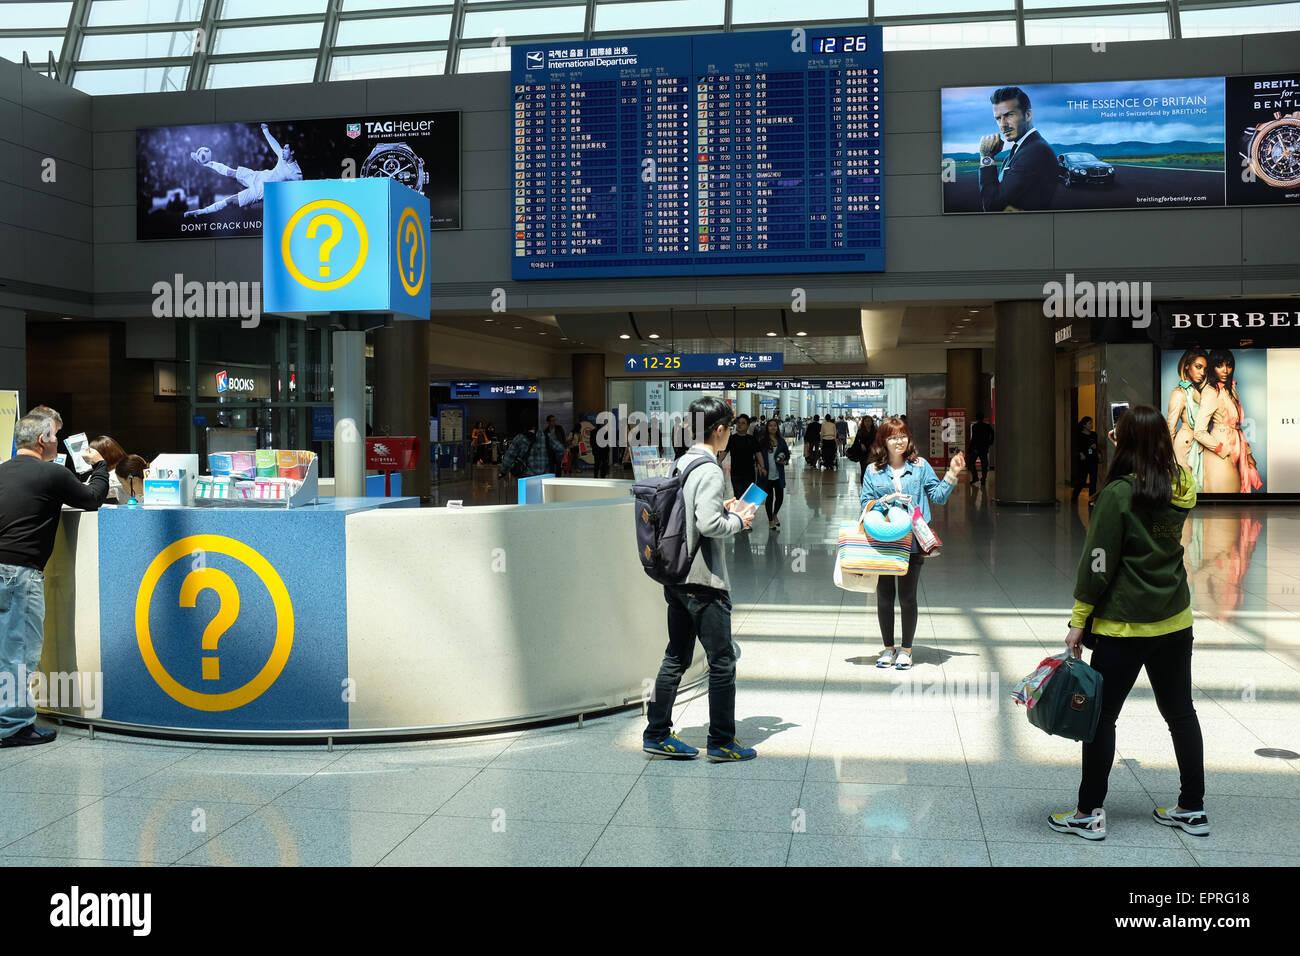 Incheon airport near Seoul, South Korea. - Stock Image